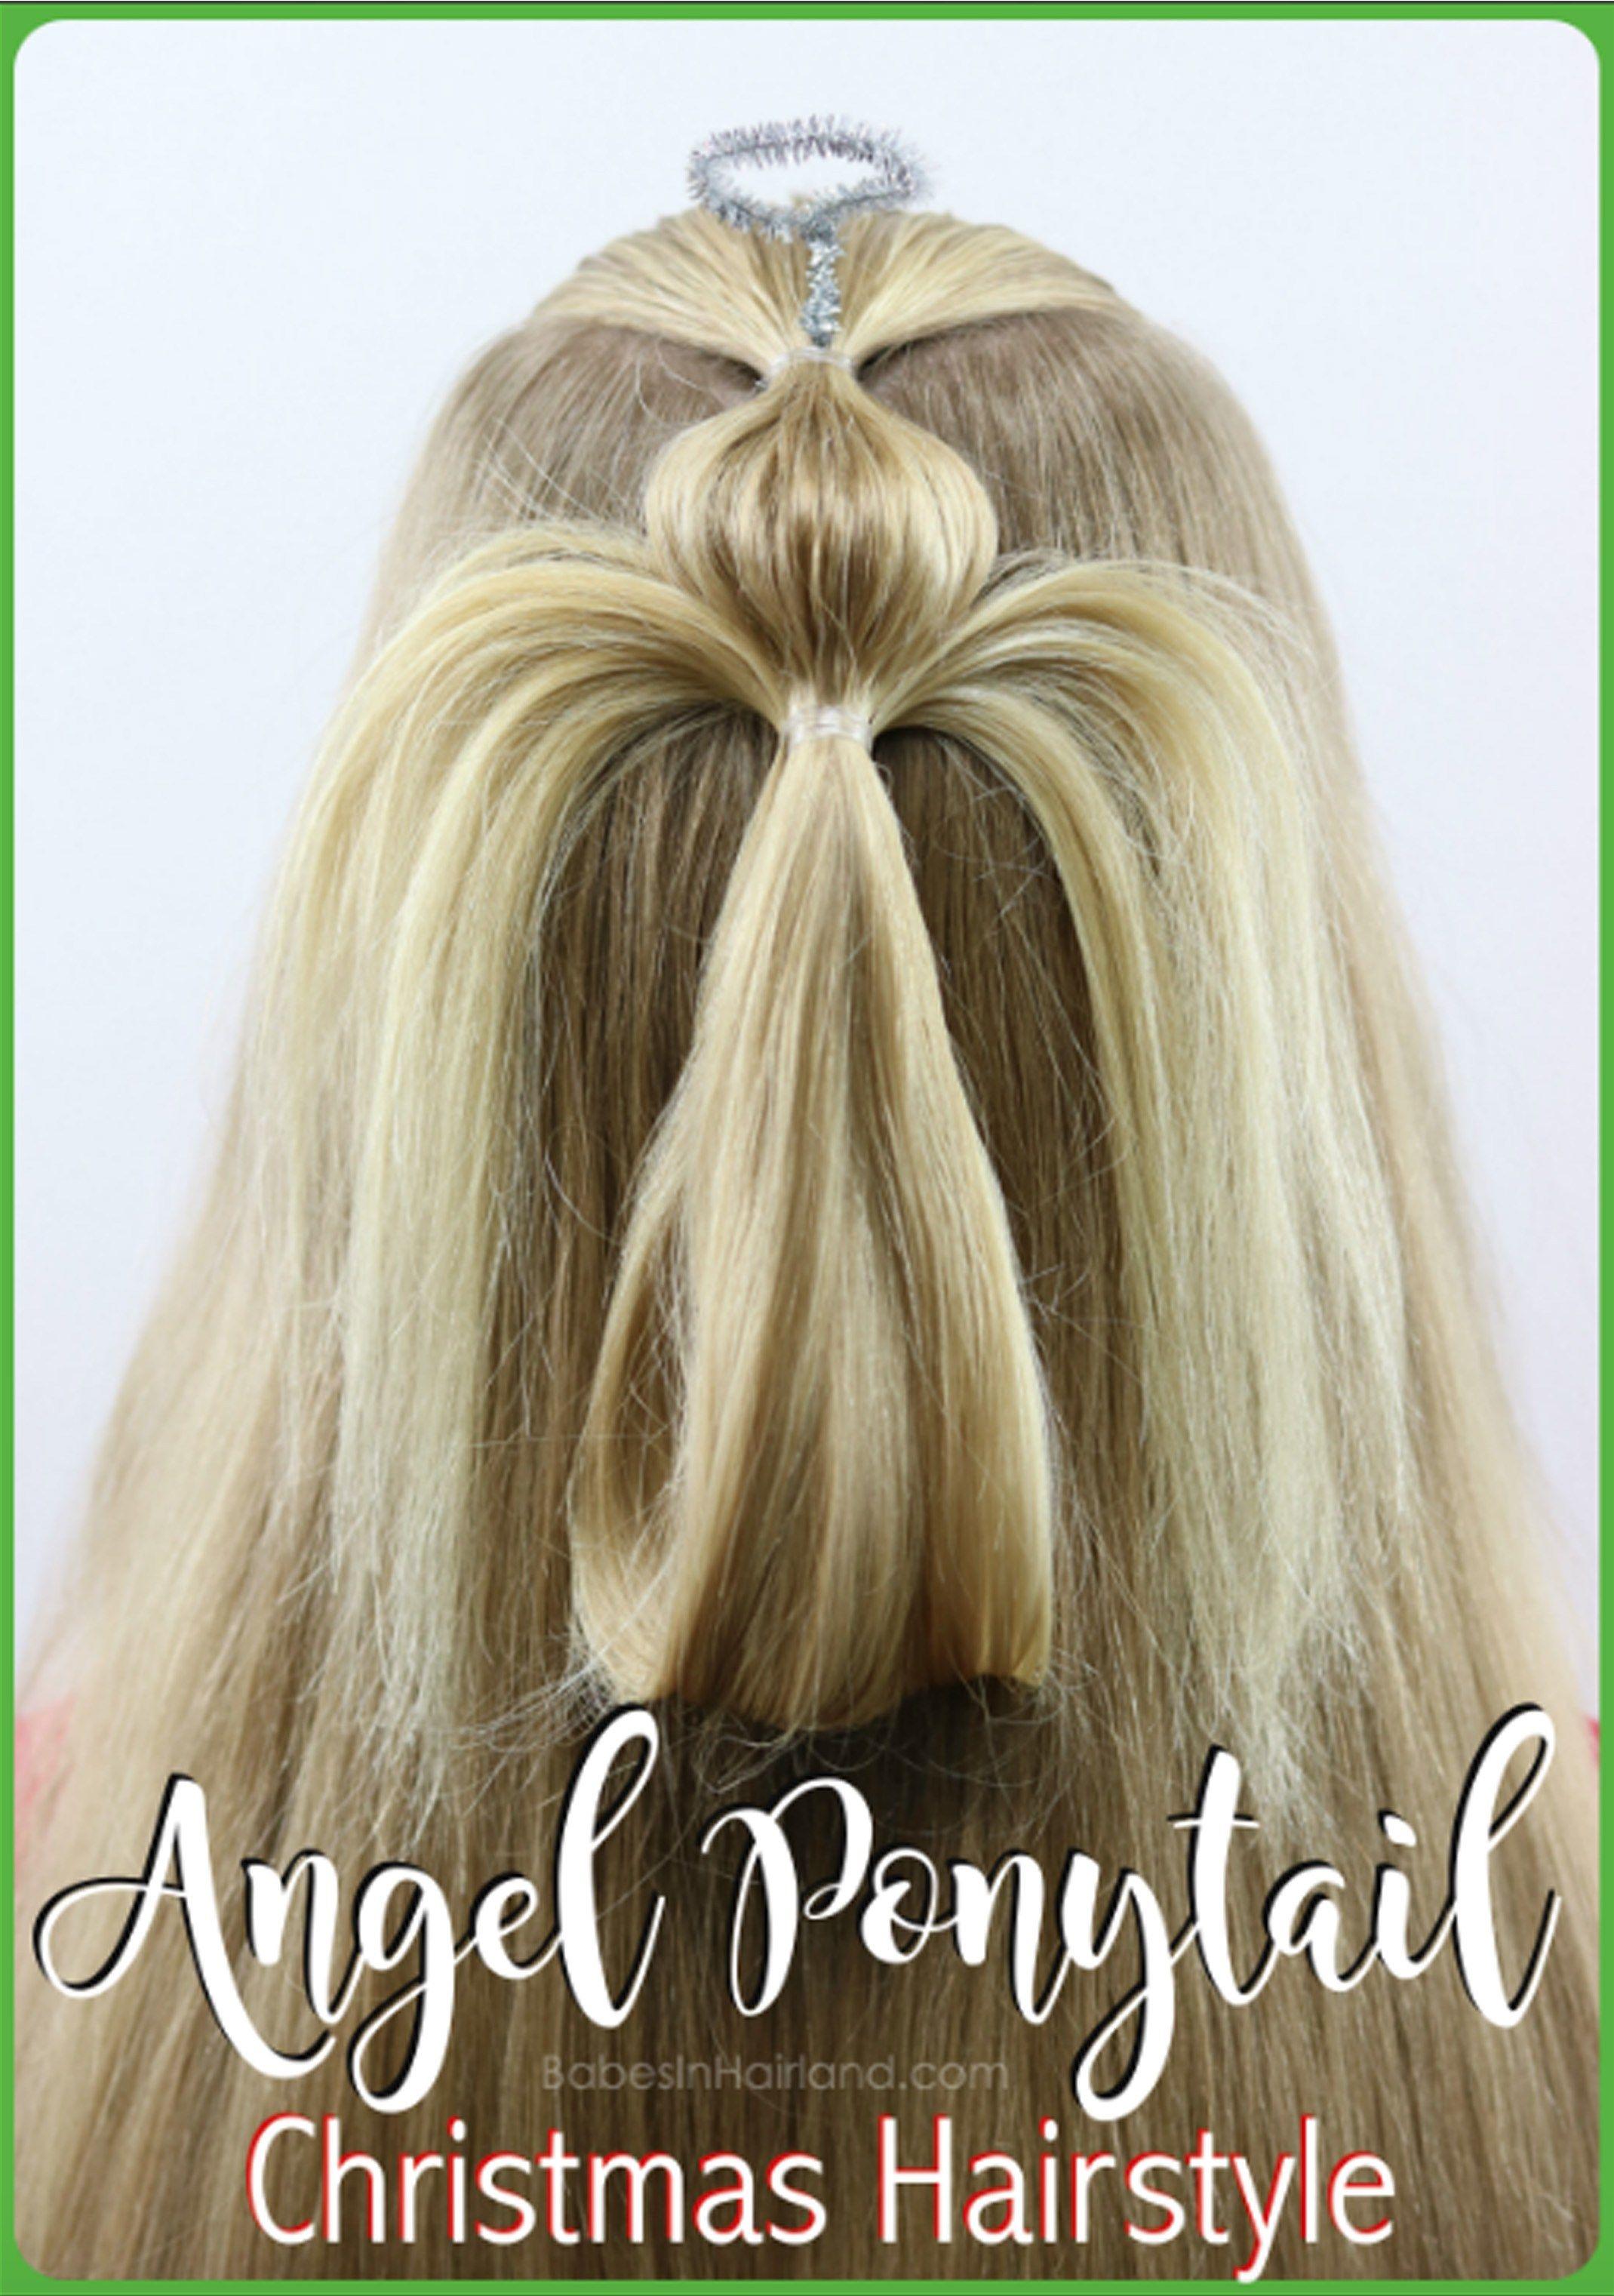 Angel ponytail hair pinterest hair styles christmas